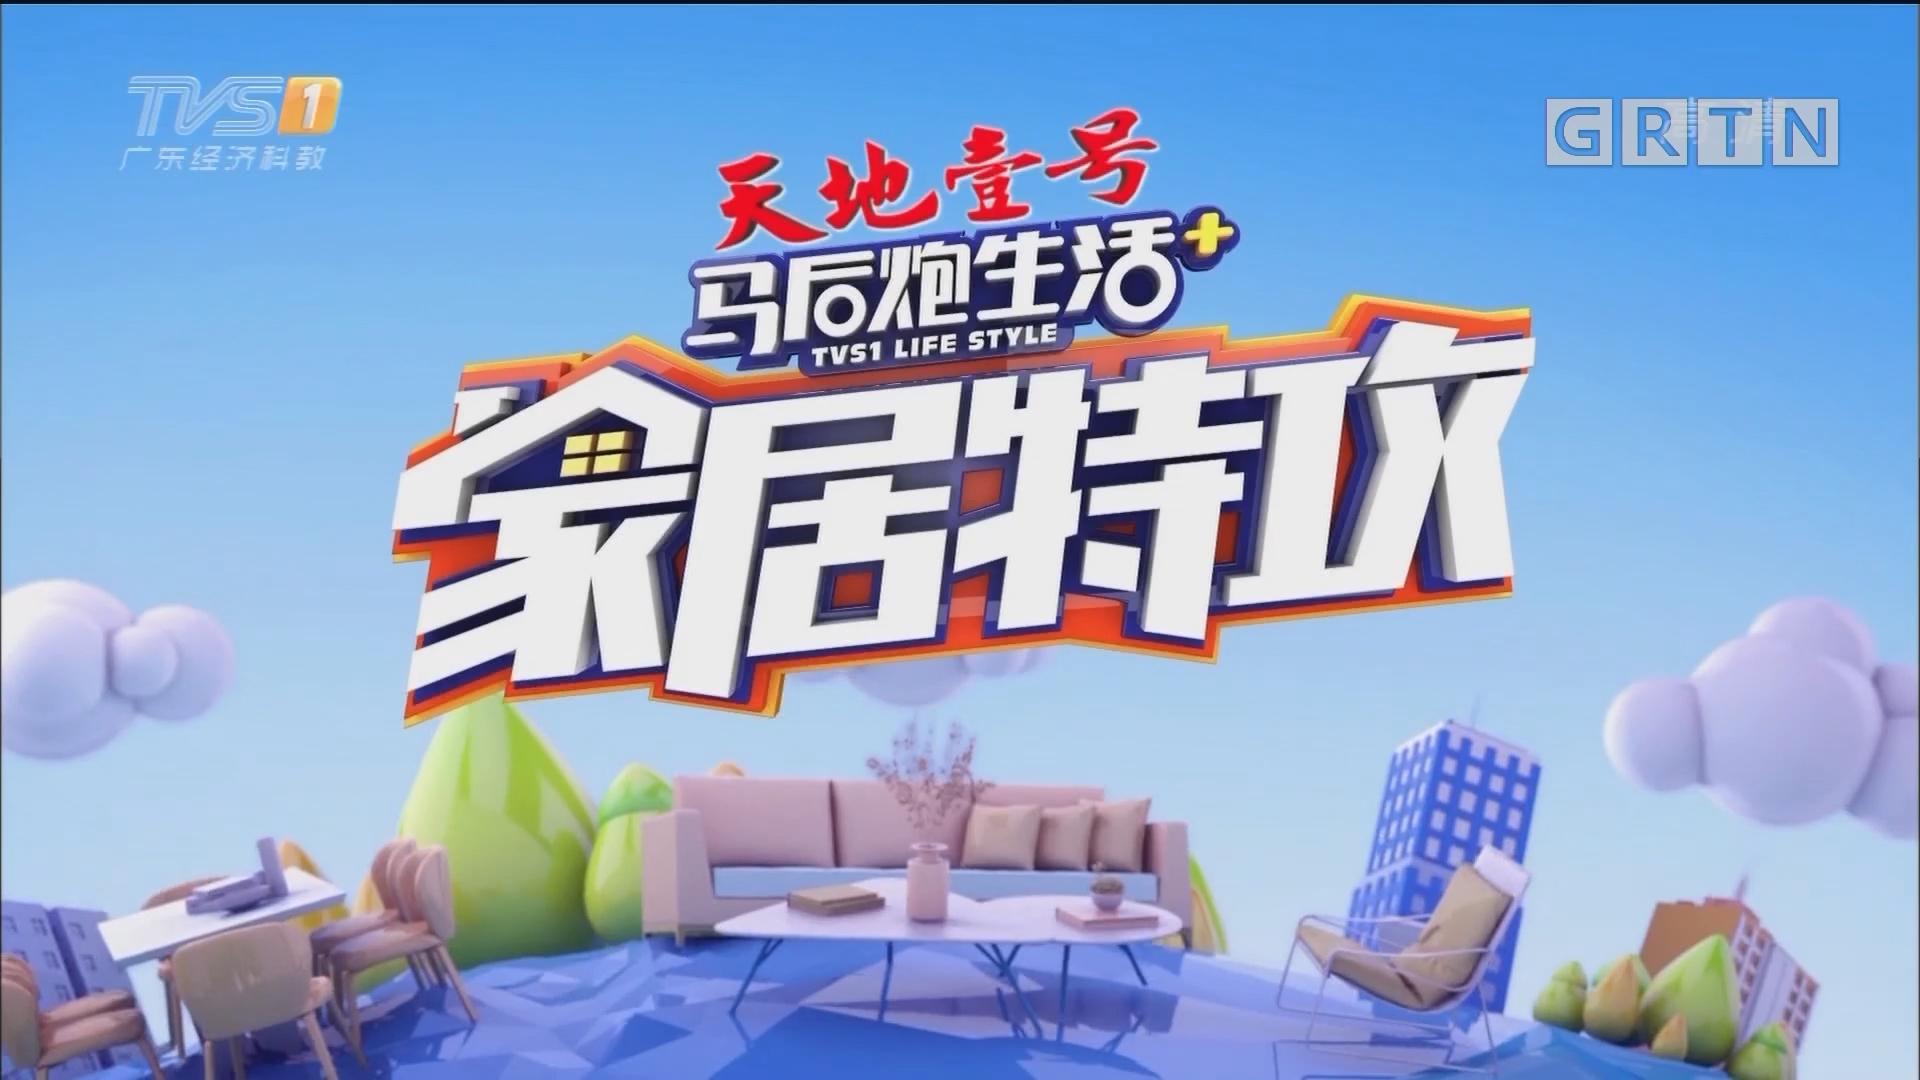 [HD][2019-07-10]马后炮生活+《家居特攻》